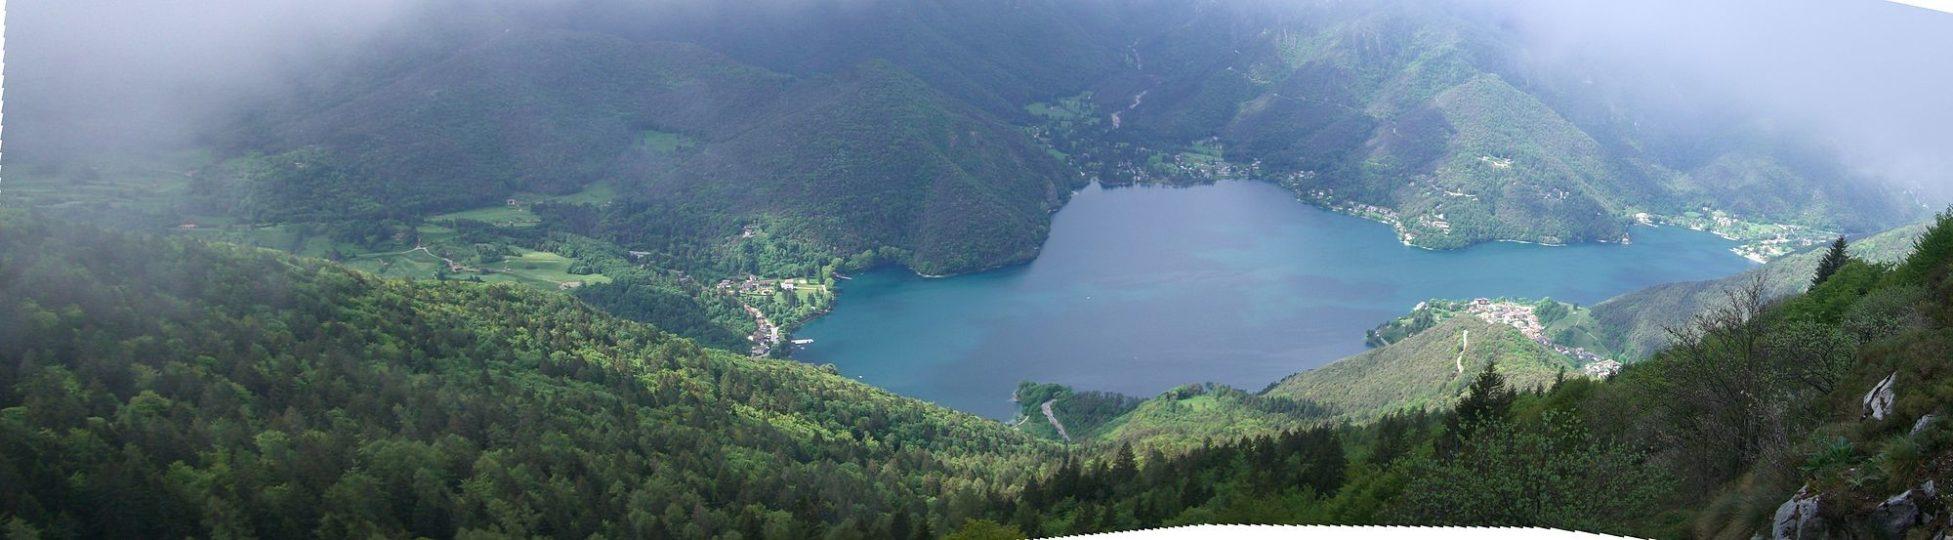 lago di ledro 2000px